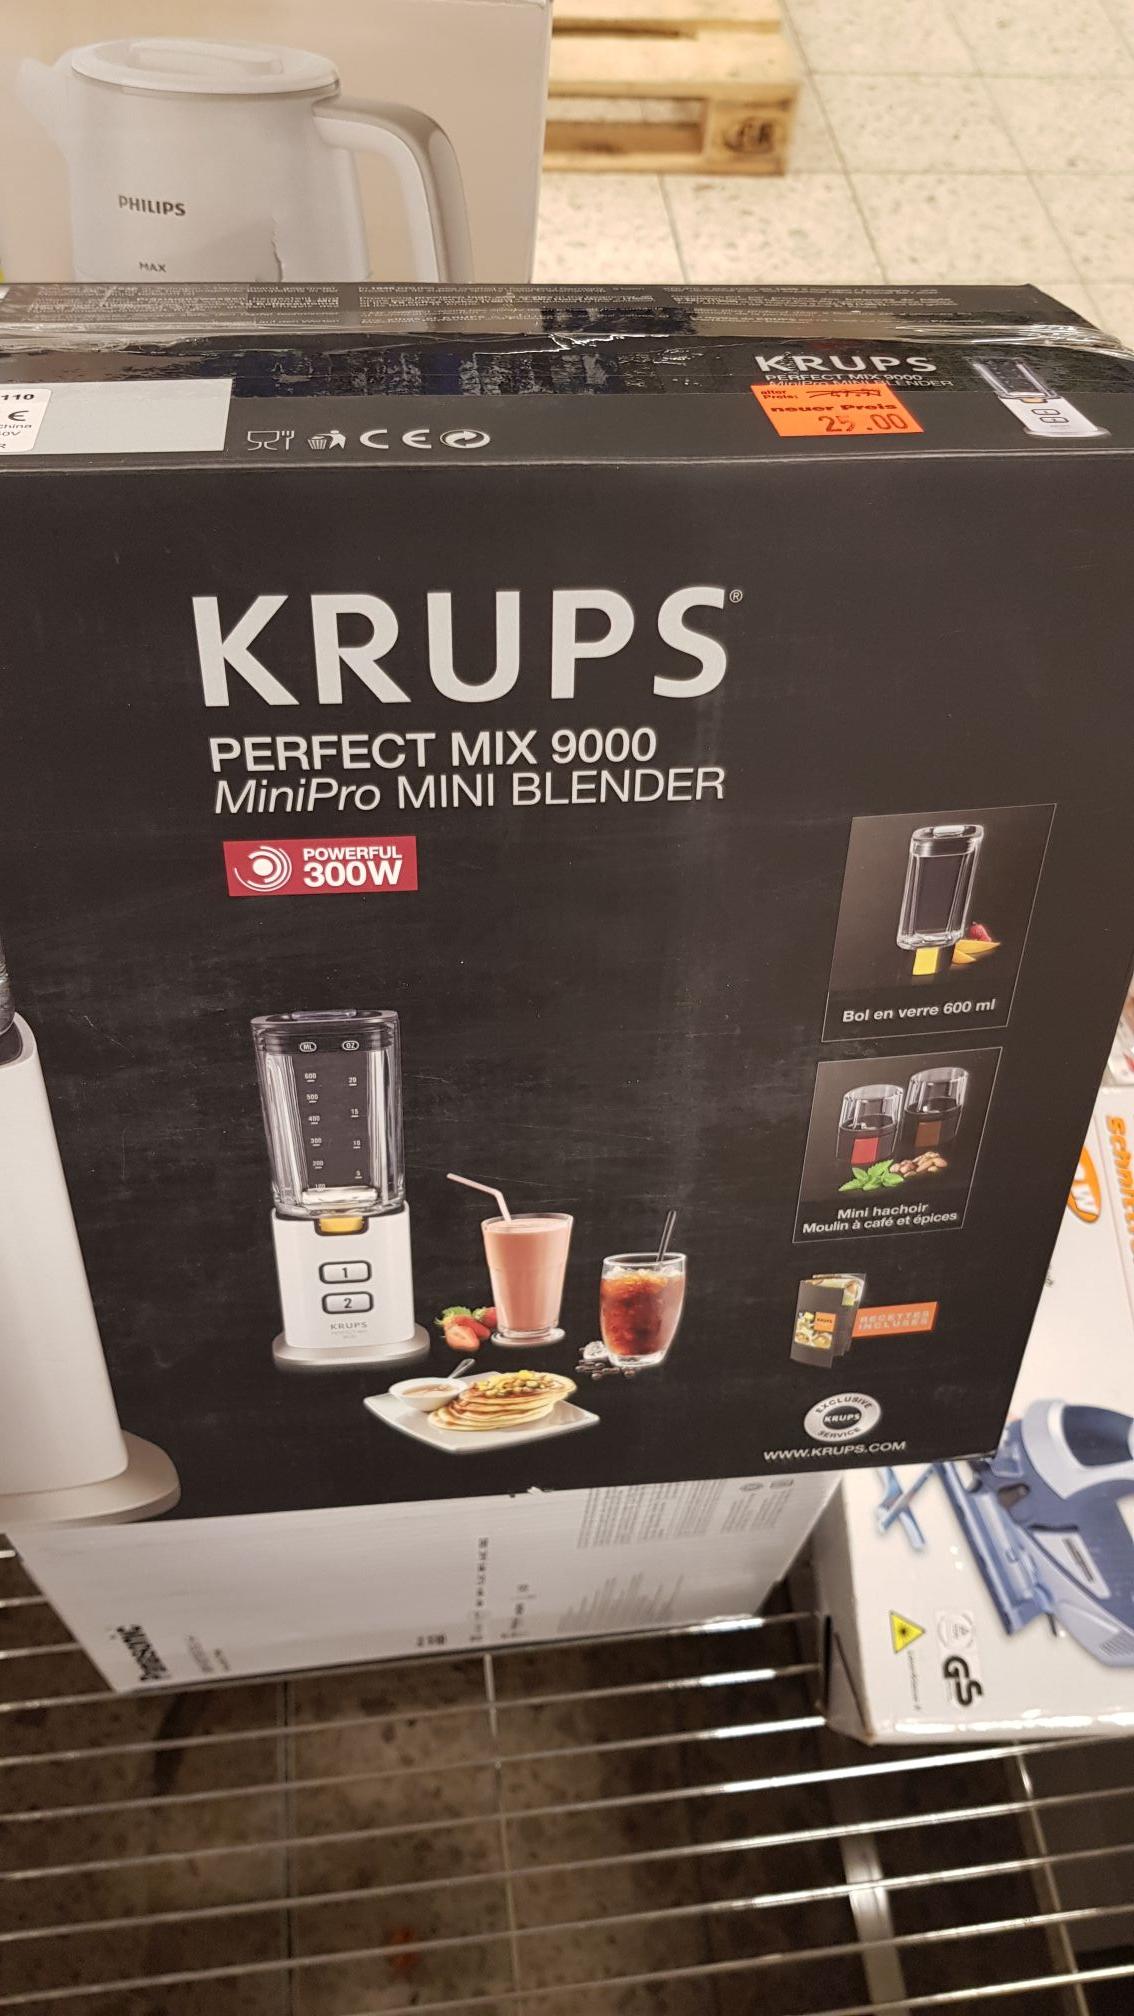 Krups Perfect Mix 9000 Standmixer - Marktkauf Görlitz [Lokal]